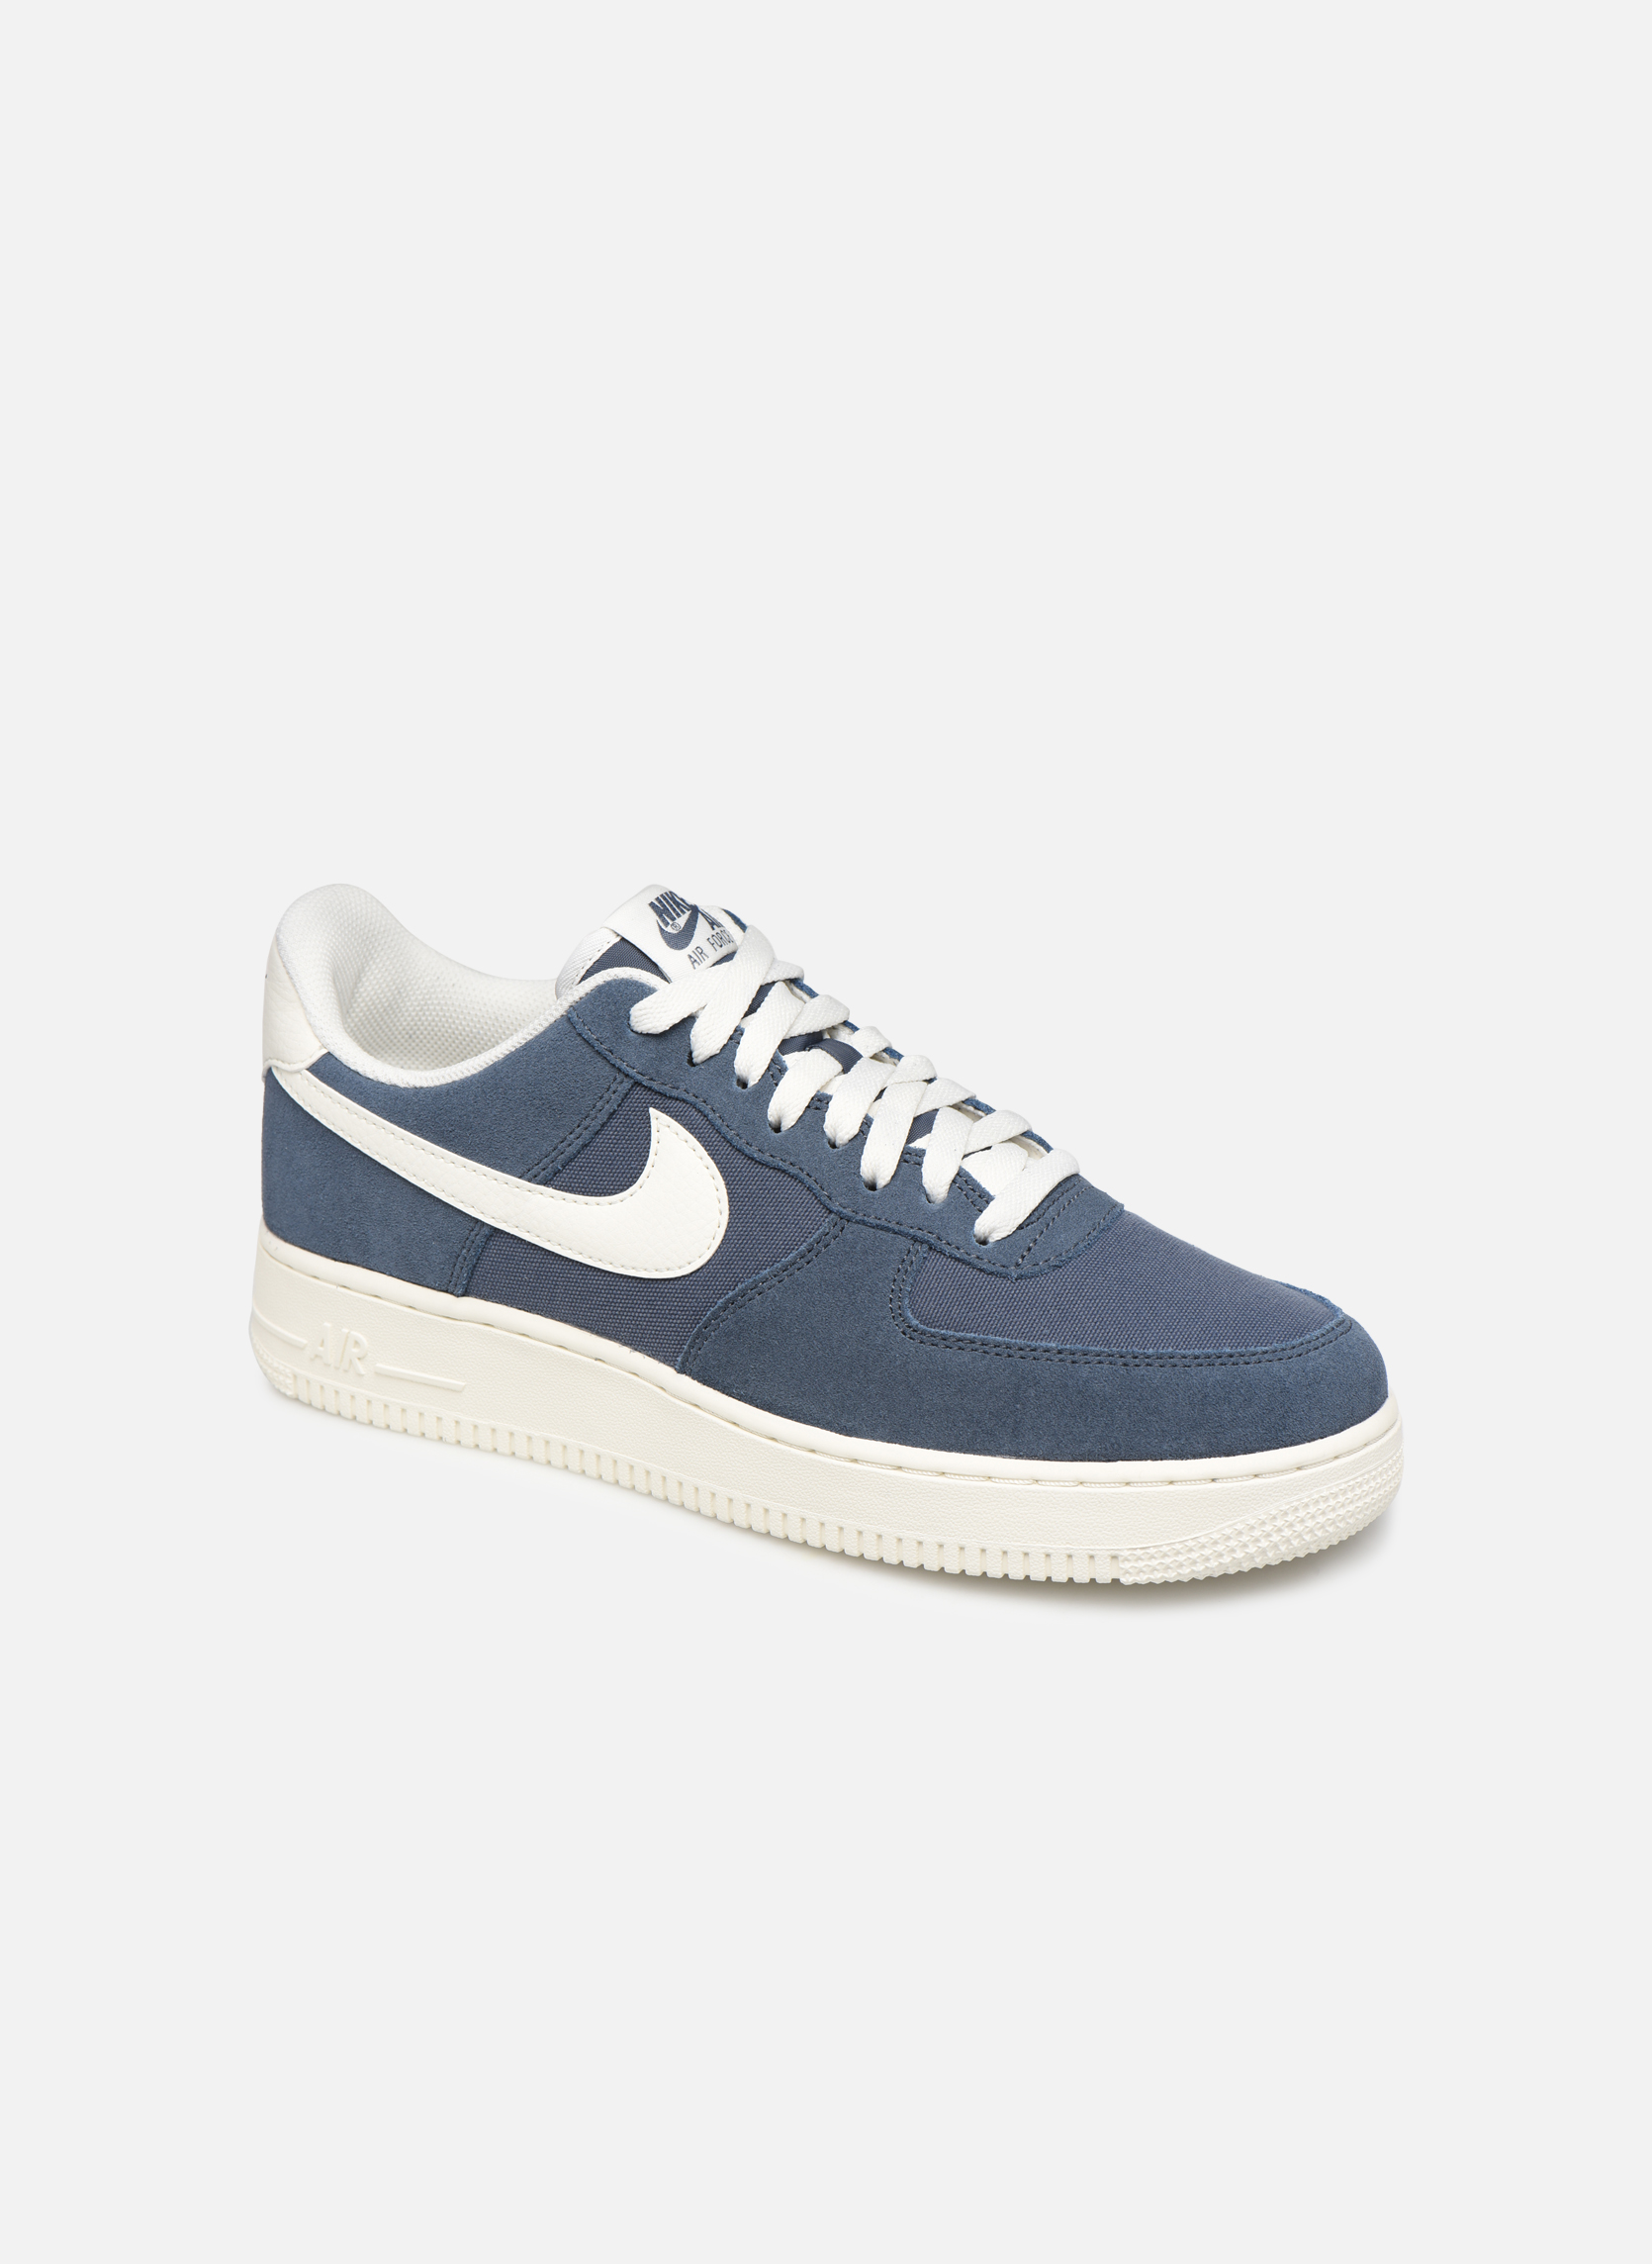 Sneakers Air Force 1 '07 2 by Nike